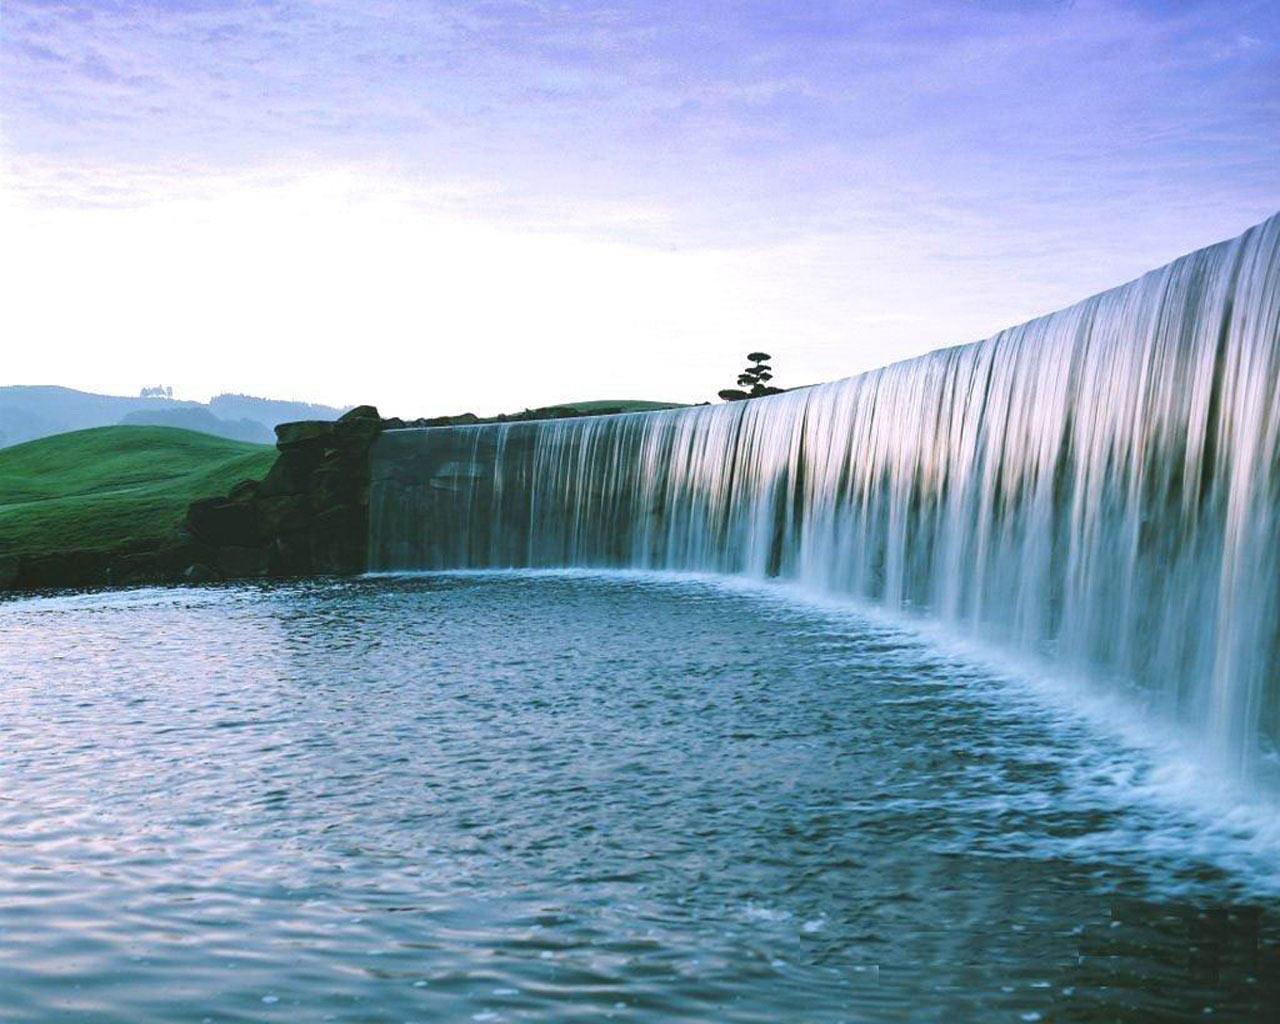 Desktop Waterfall Wallpaper Download Nature Beauty NextChanel 1280x1024